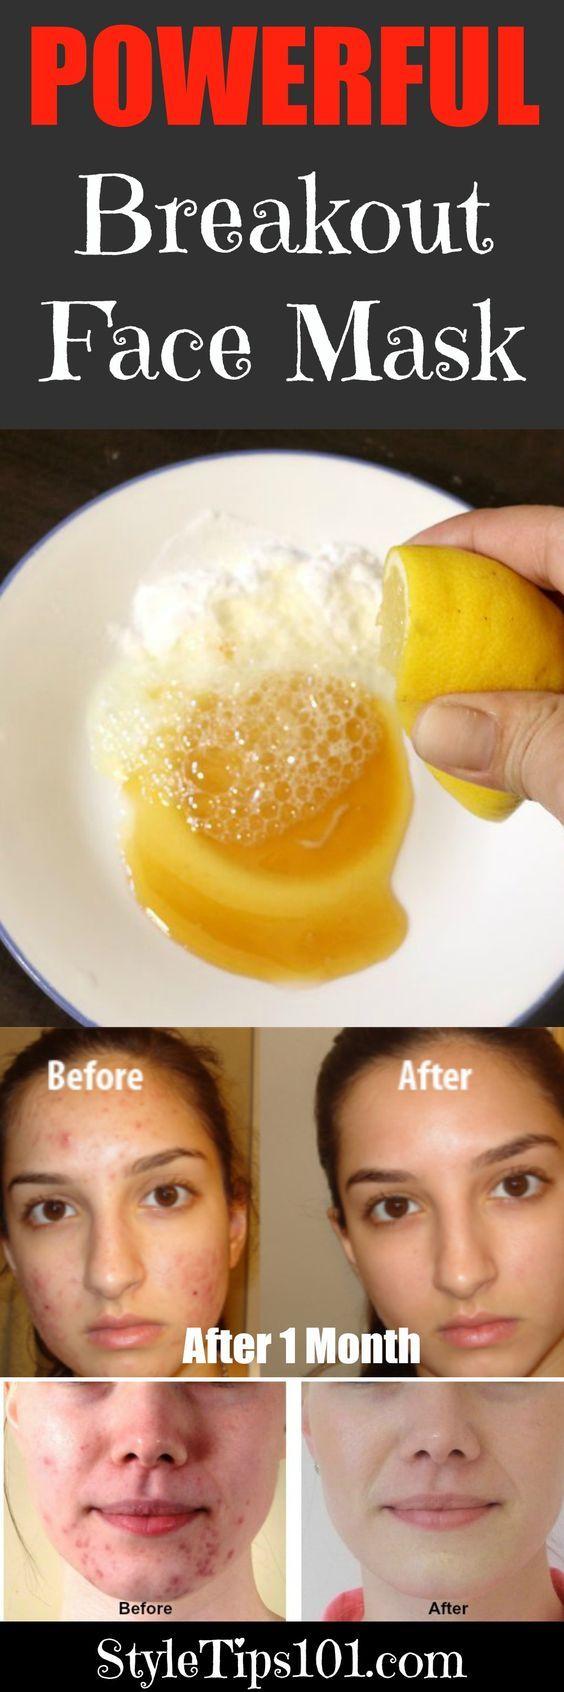 Aspirin on piercing bump before and after  Ioanna Peralta ioannaperalta on Pinterest